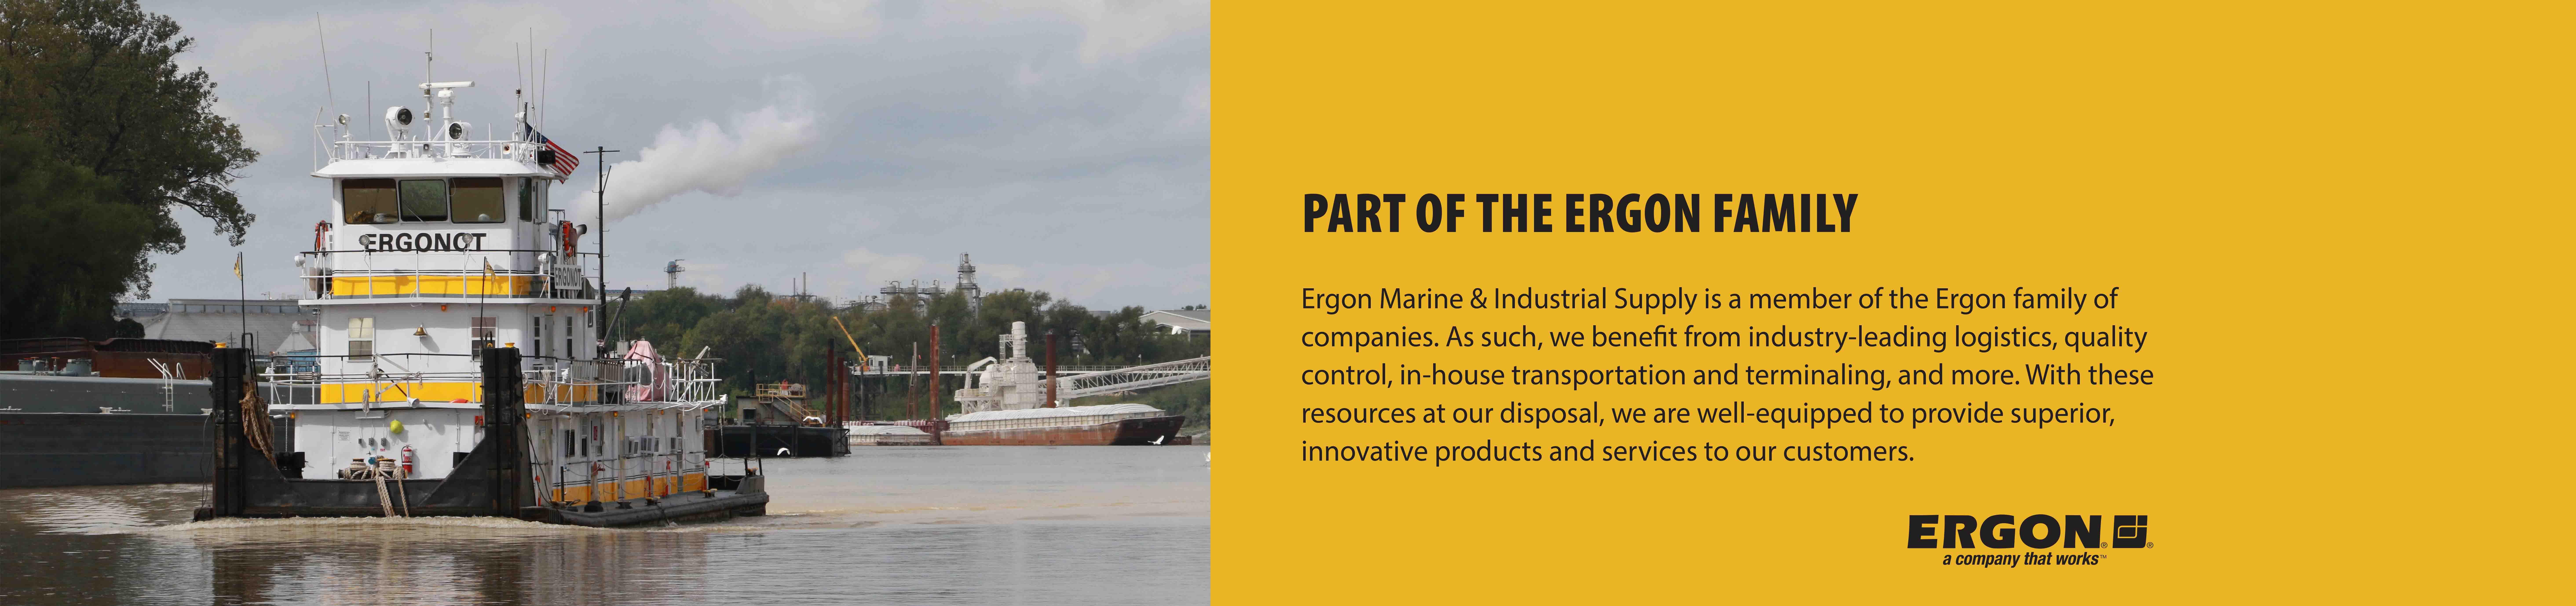 Ergon Marine Industrial Supply